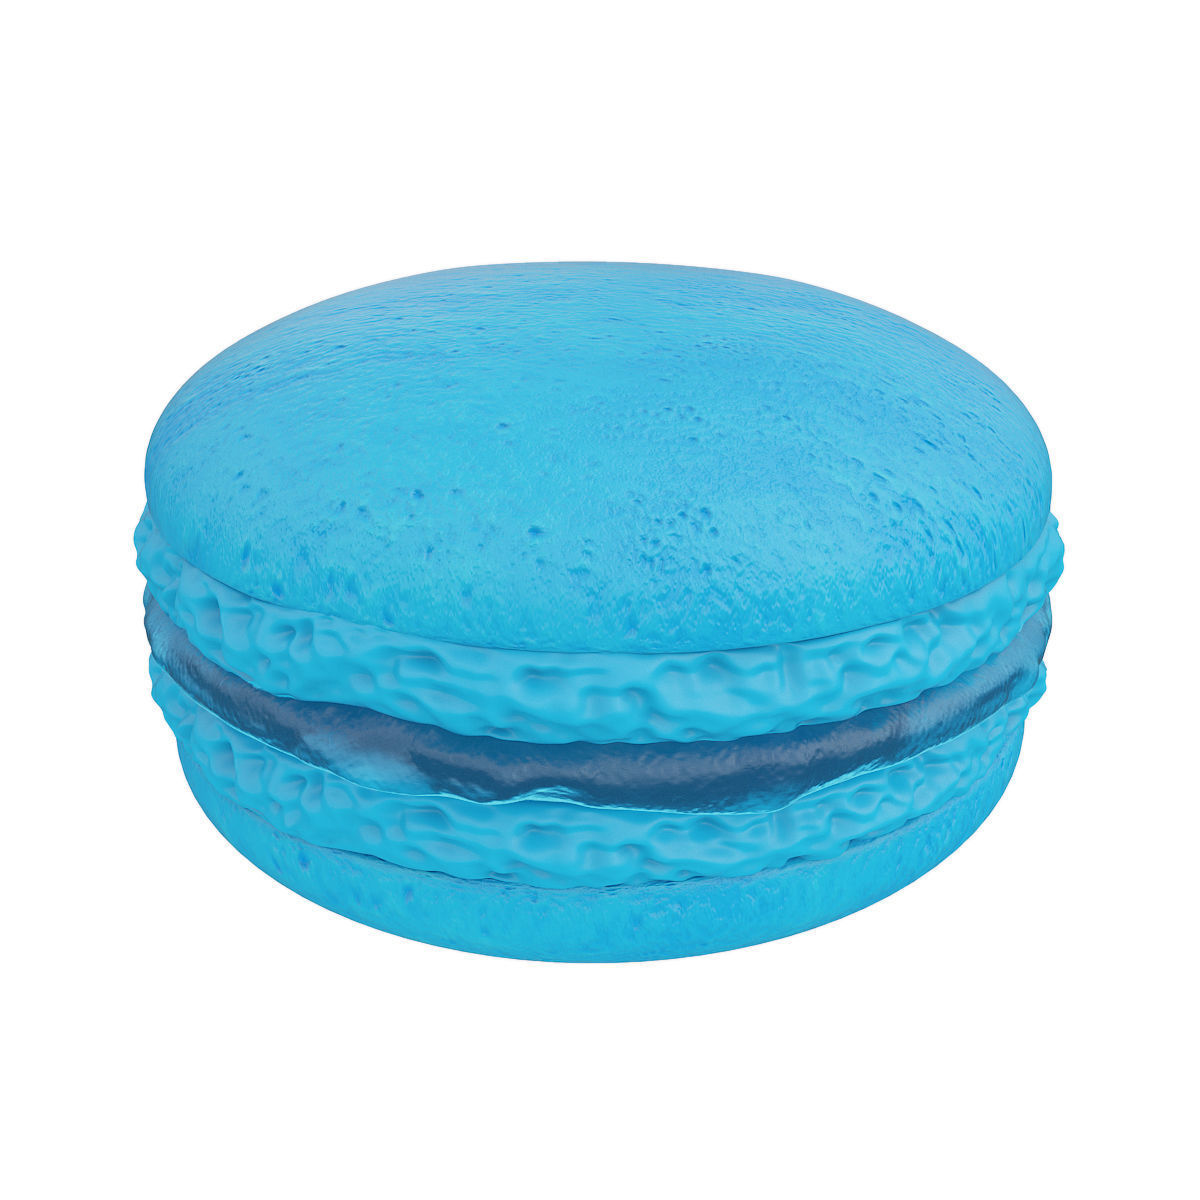 Blue macaroon with jam